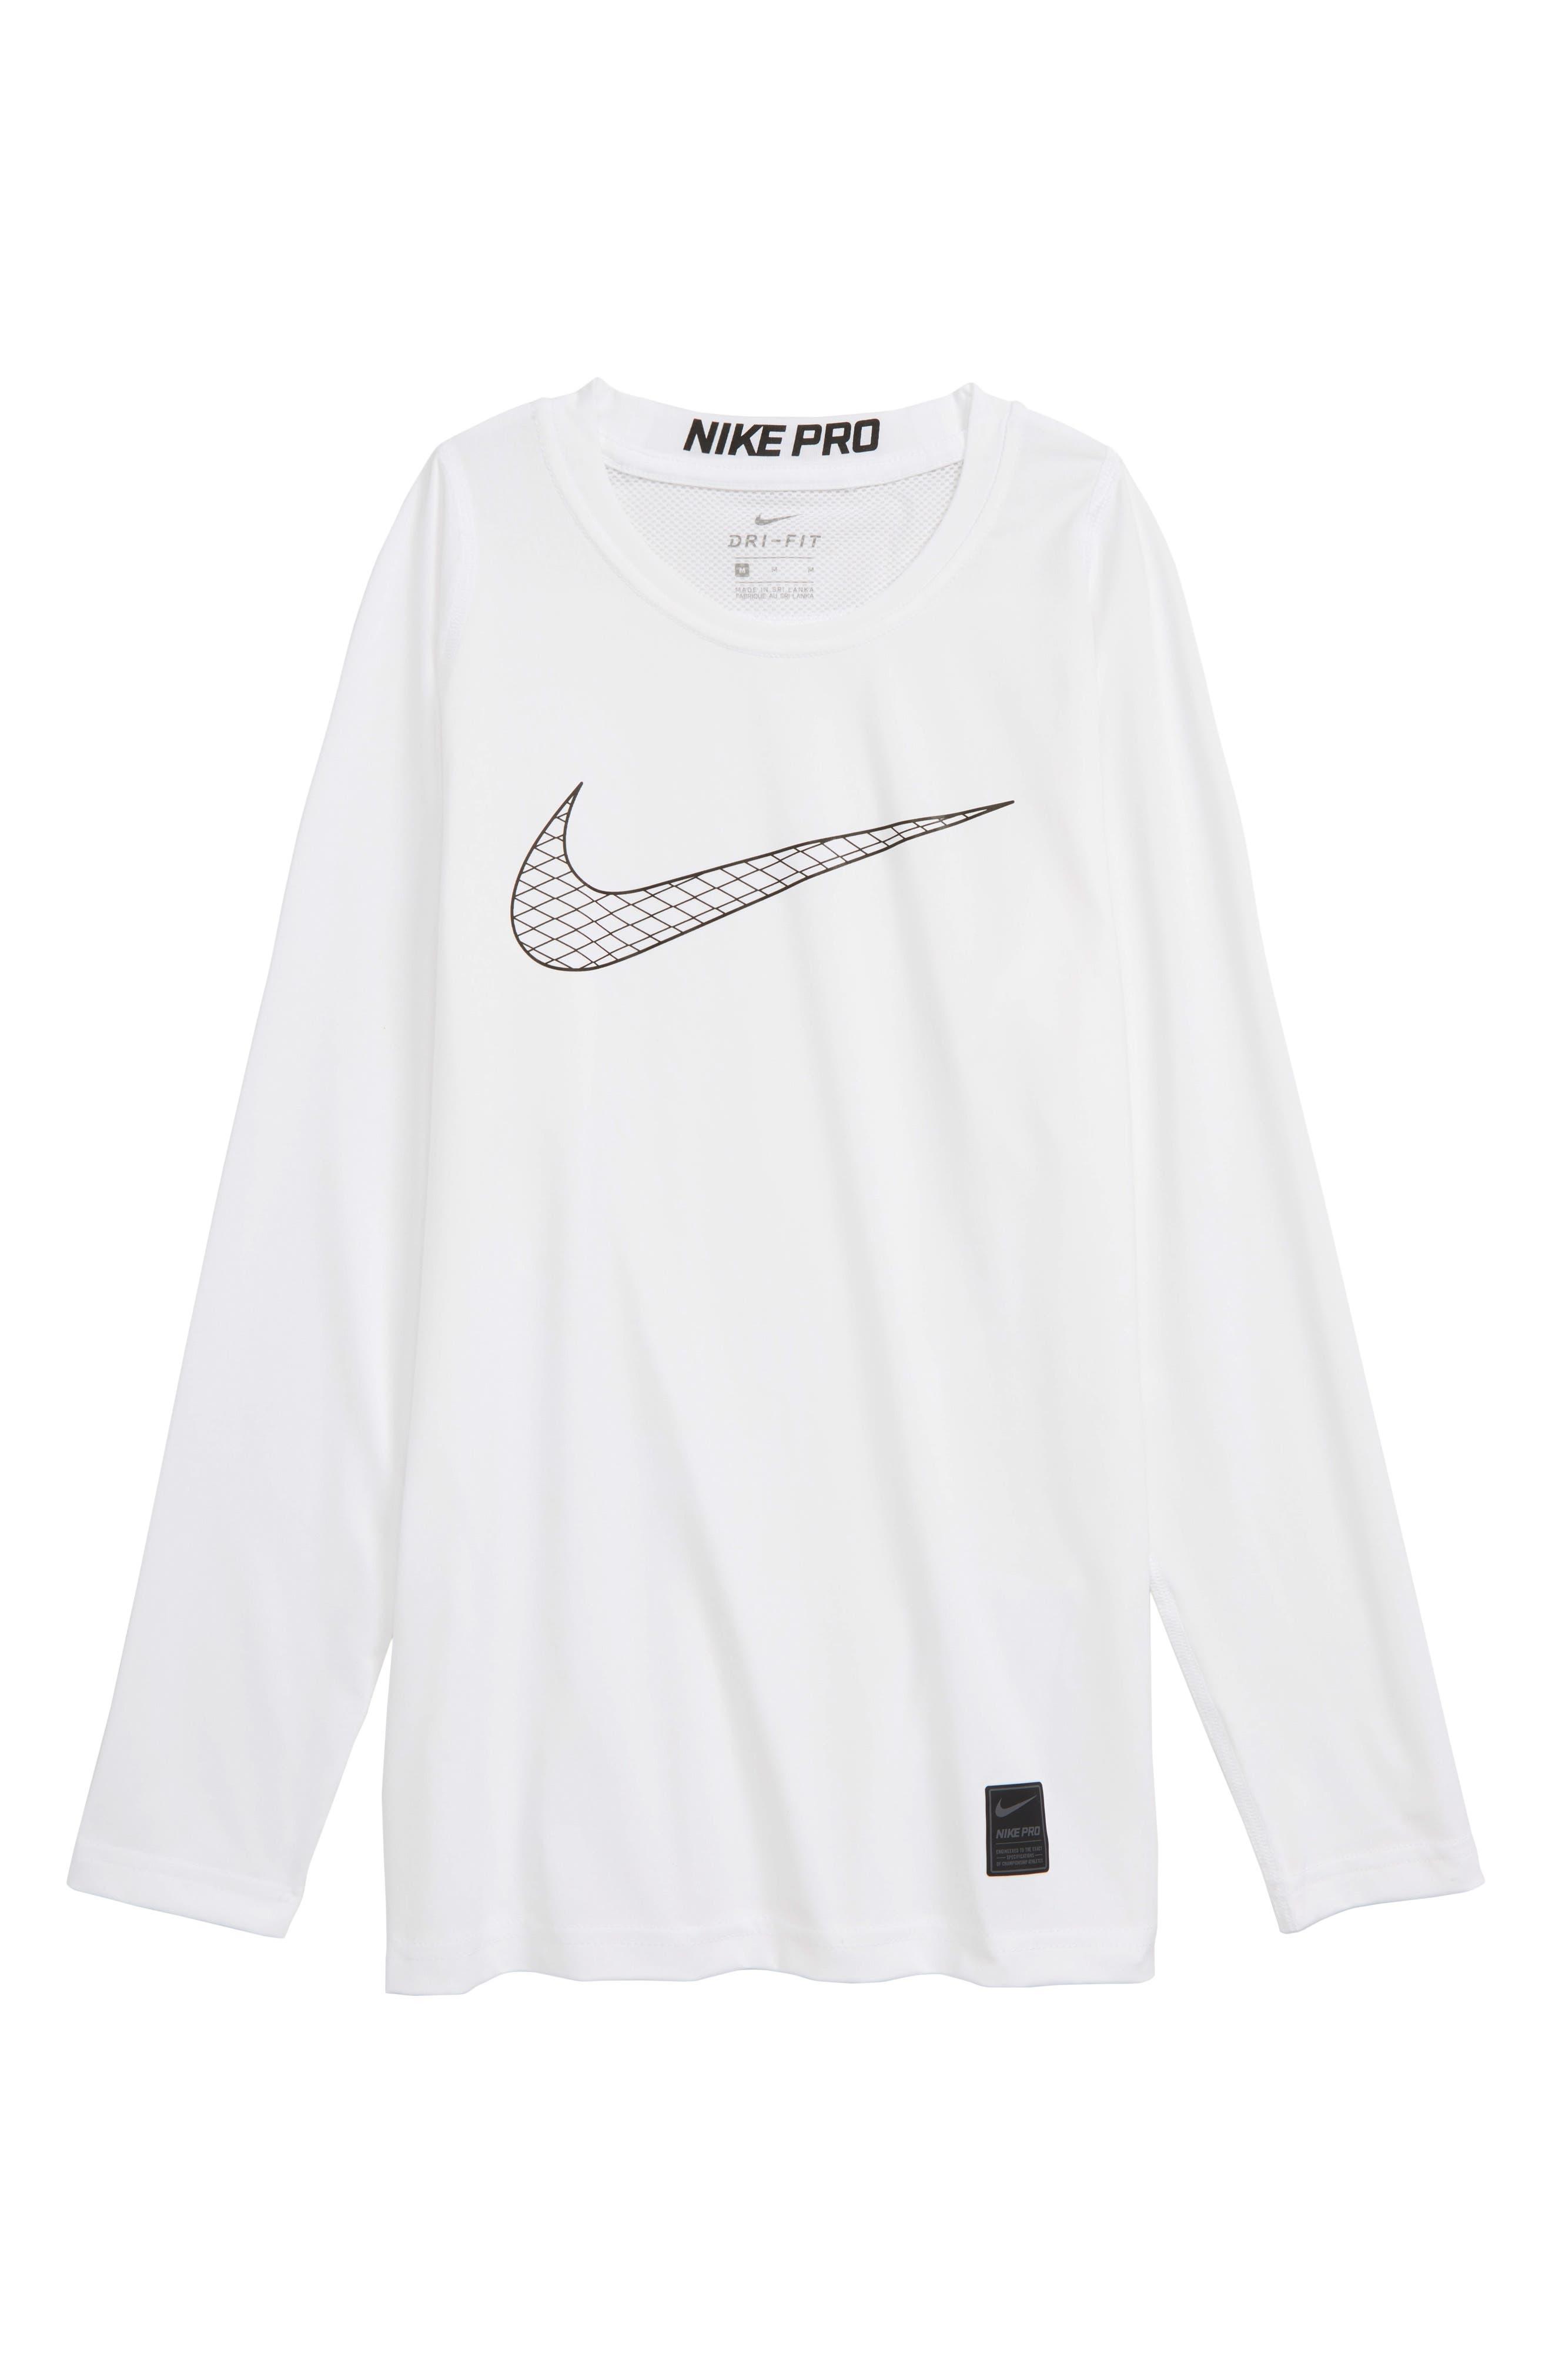 Boys Nike Clothing Hoodies Shirts Pants T Shirts